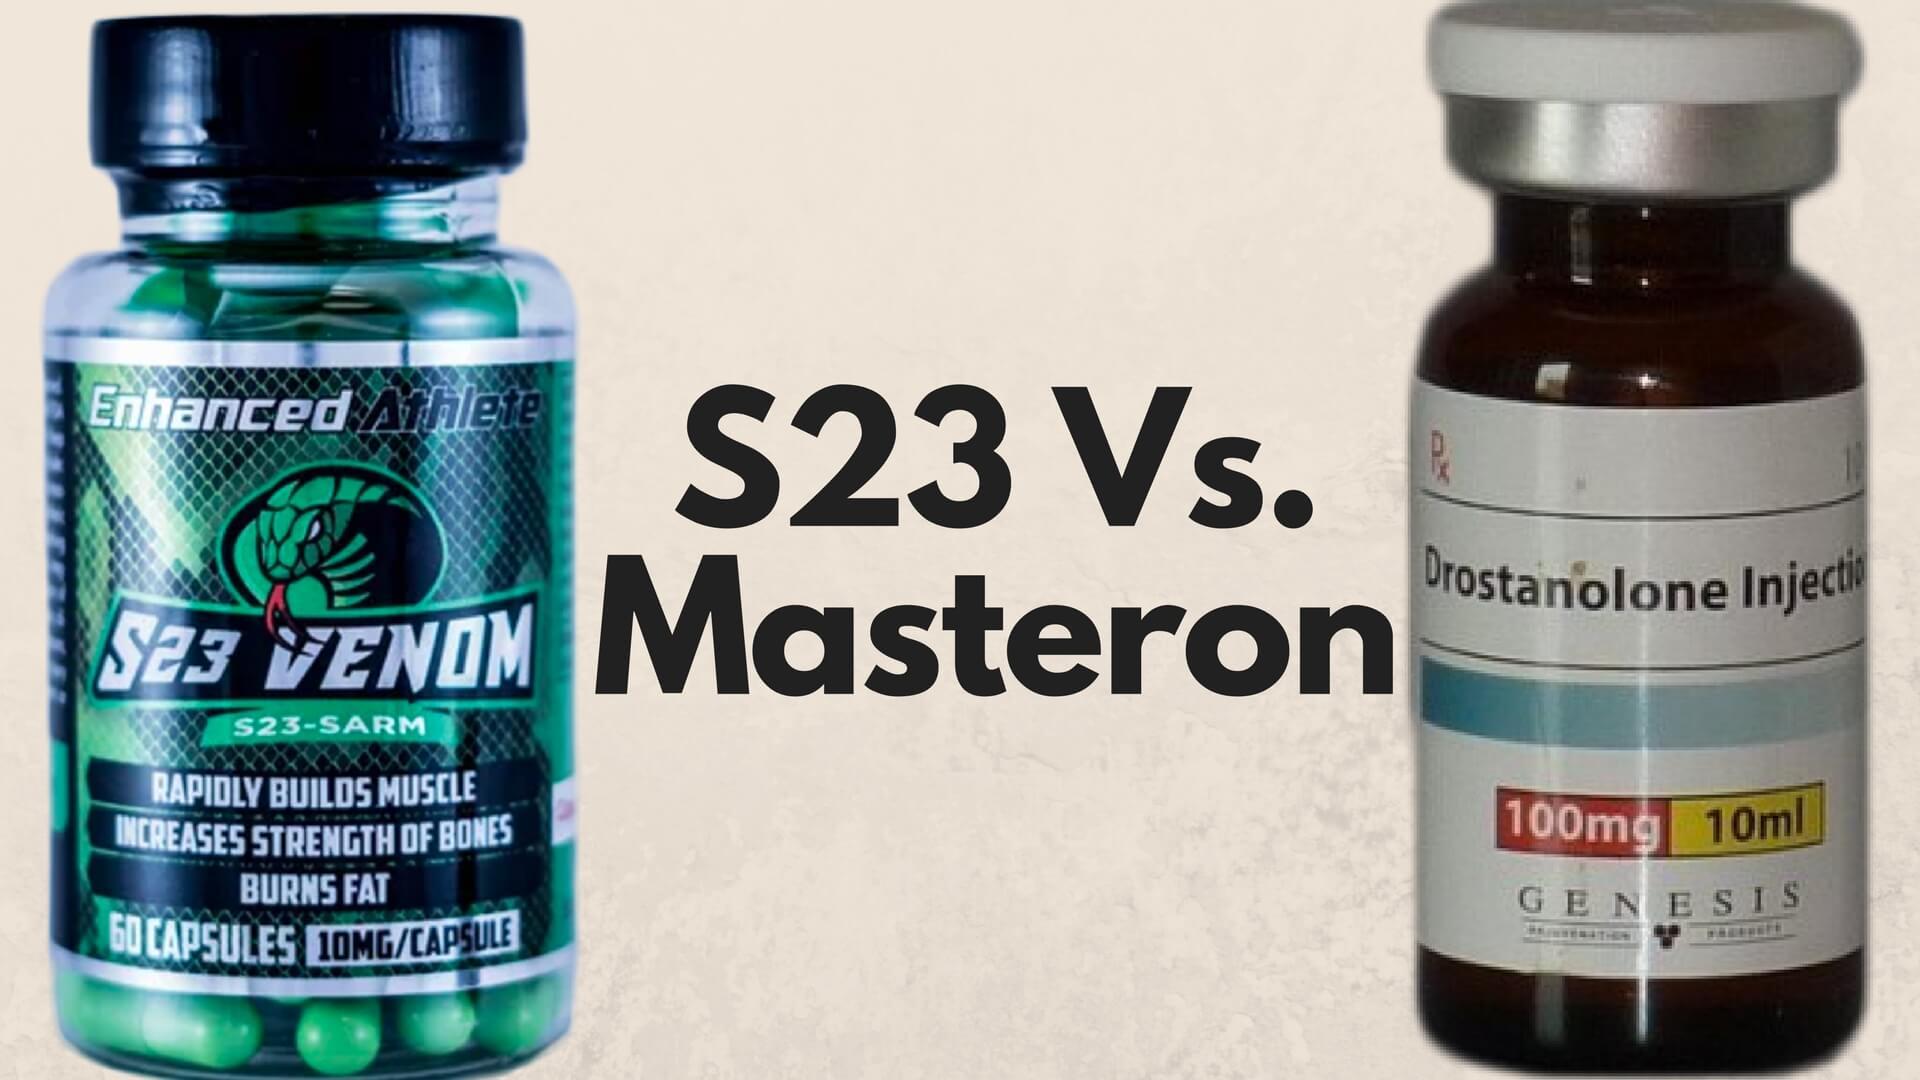 SARM S23 Vs Masteron Comparison - Viable Masteron Alternative?